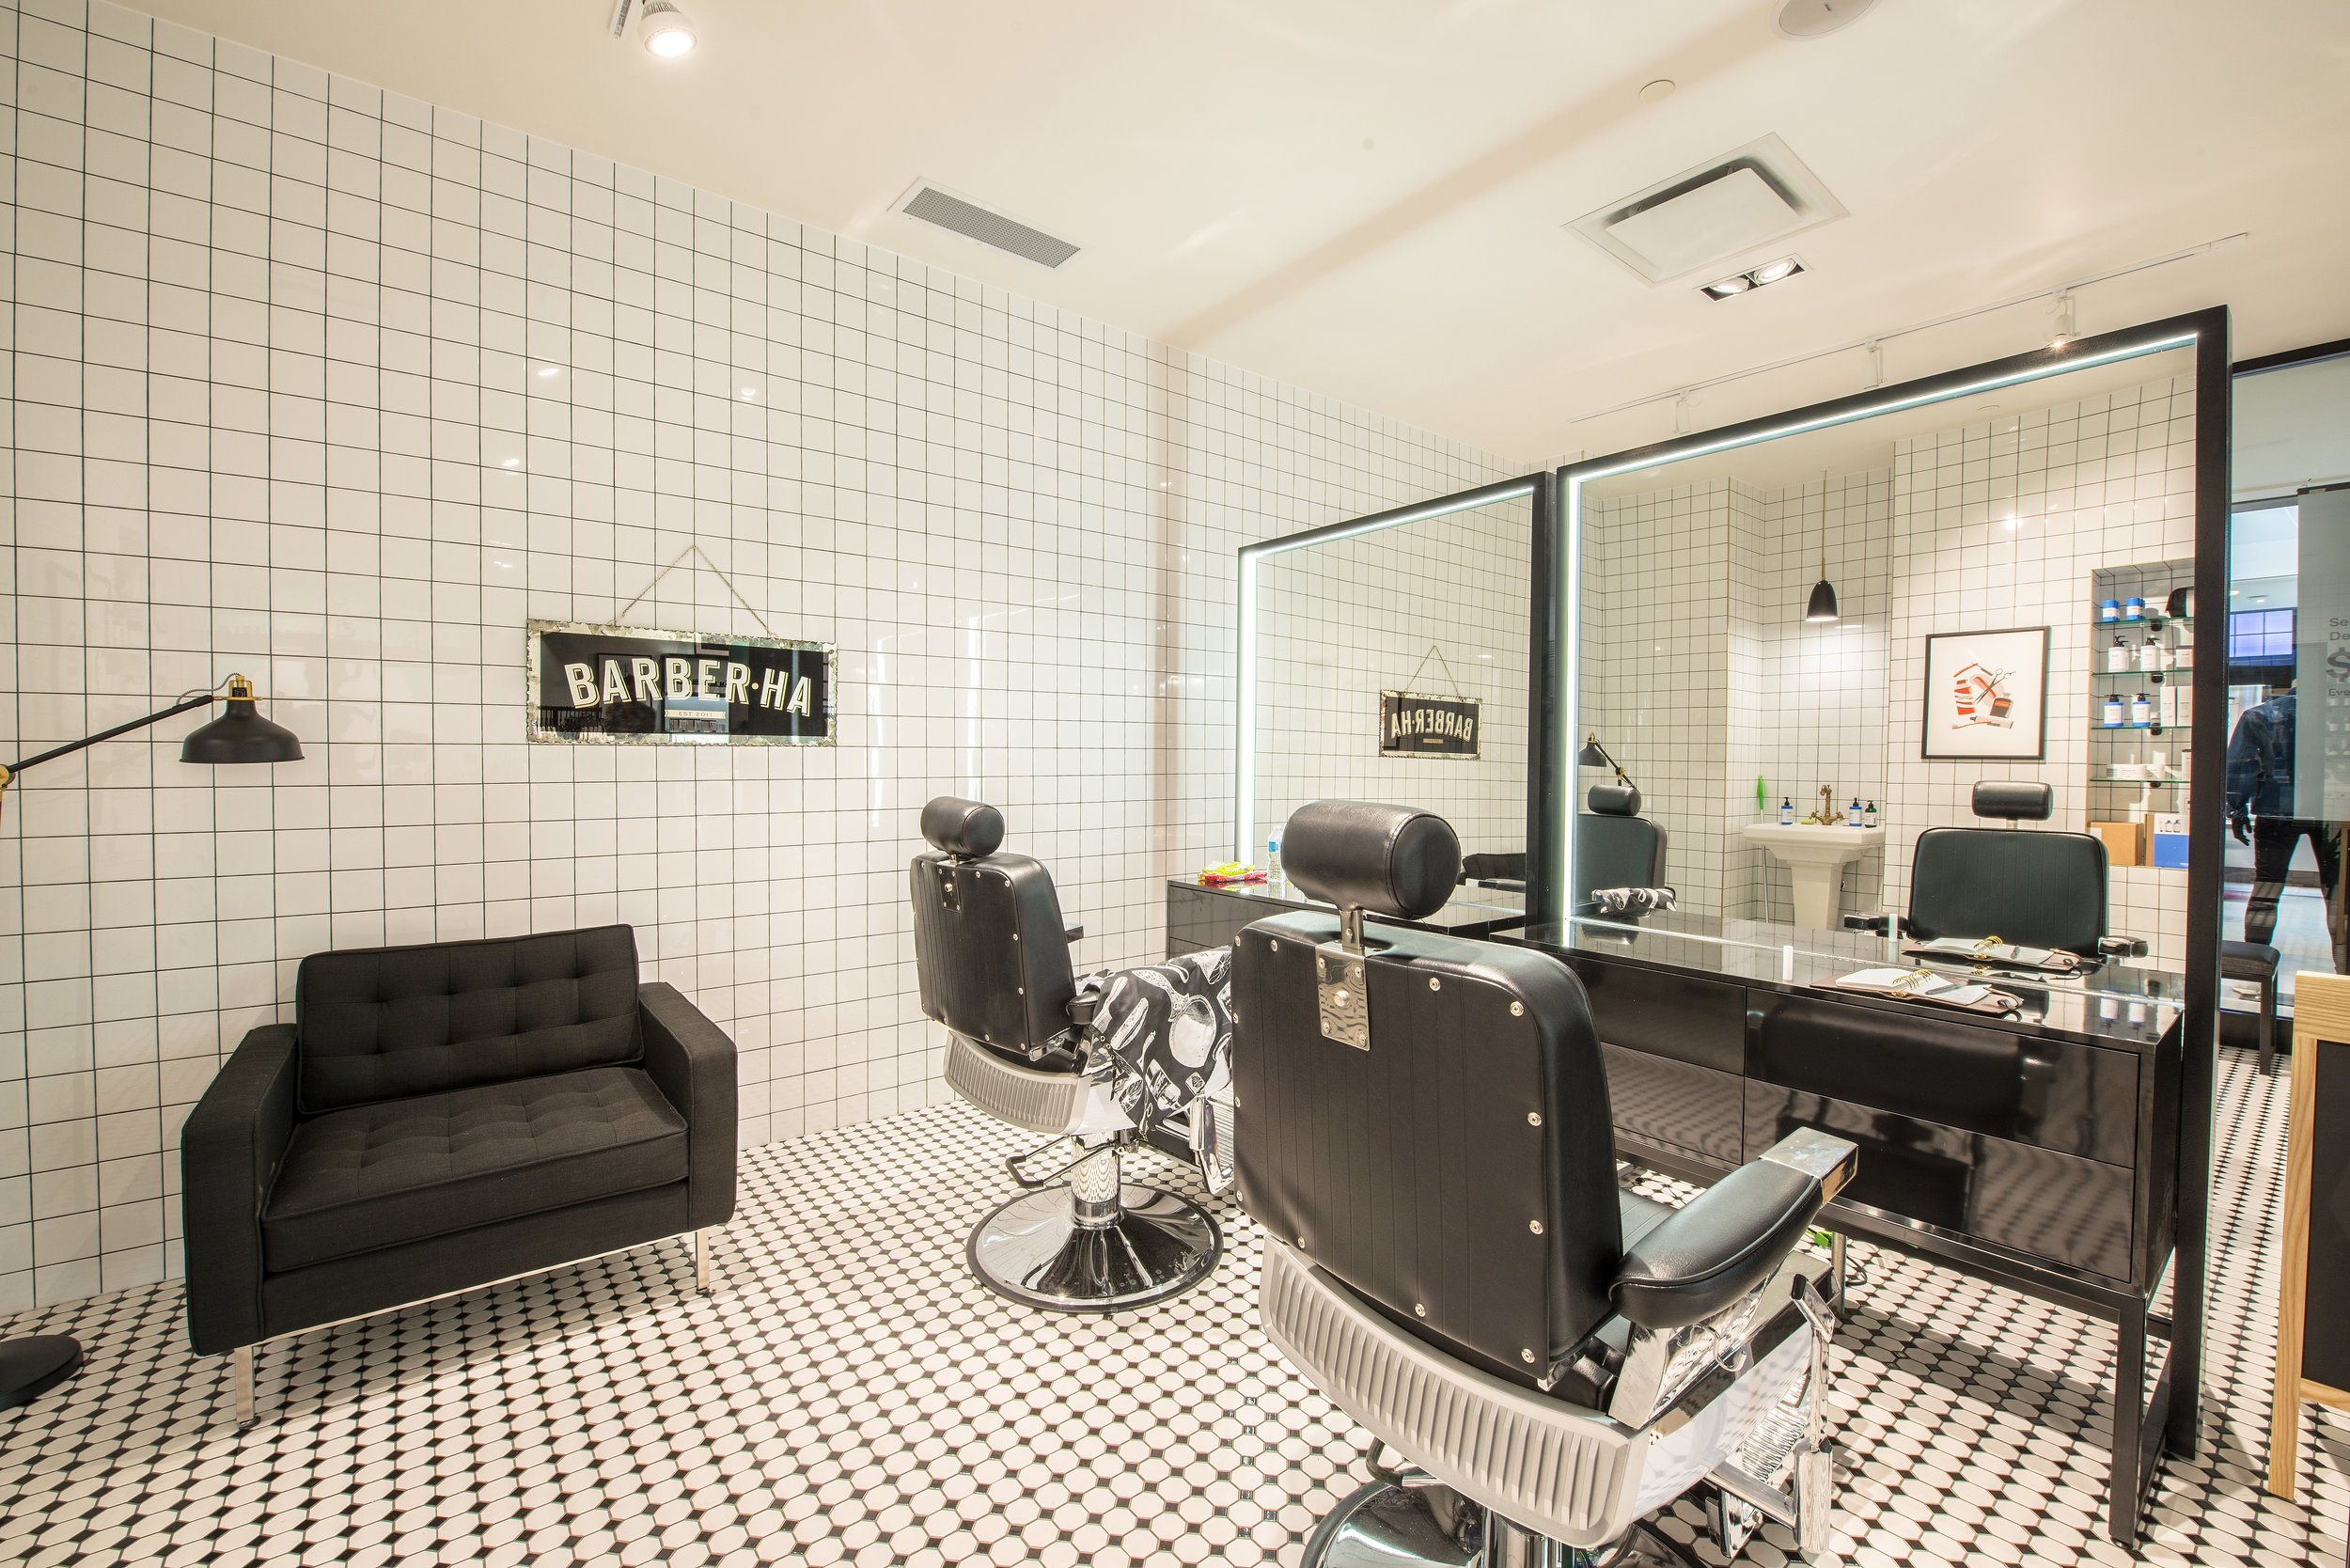 Frank + Oak Barbershop